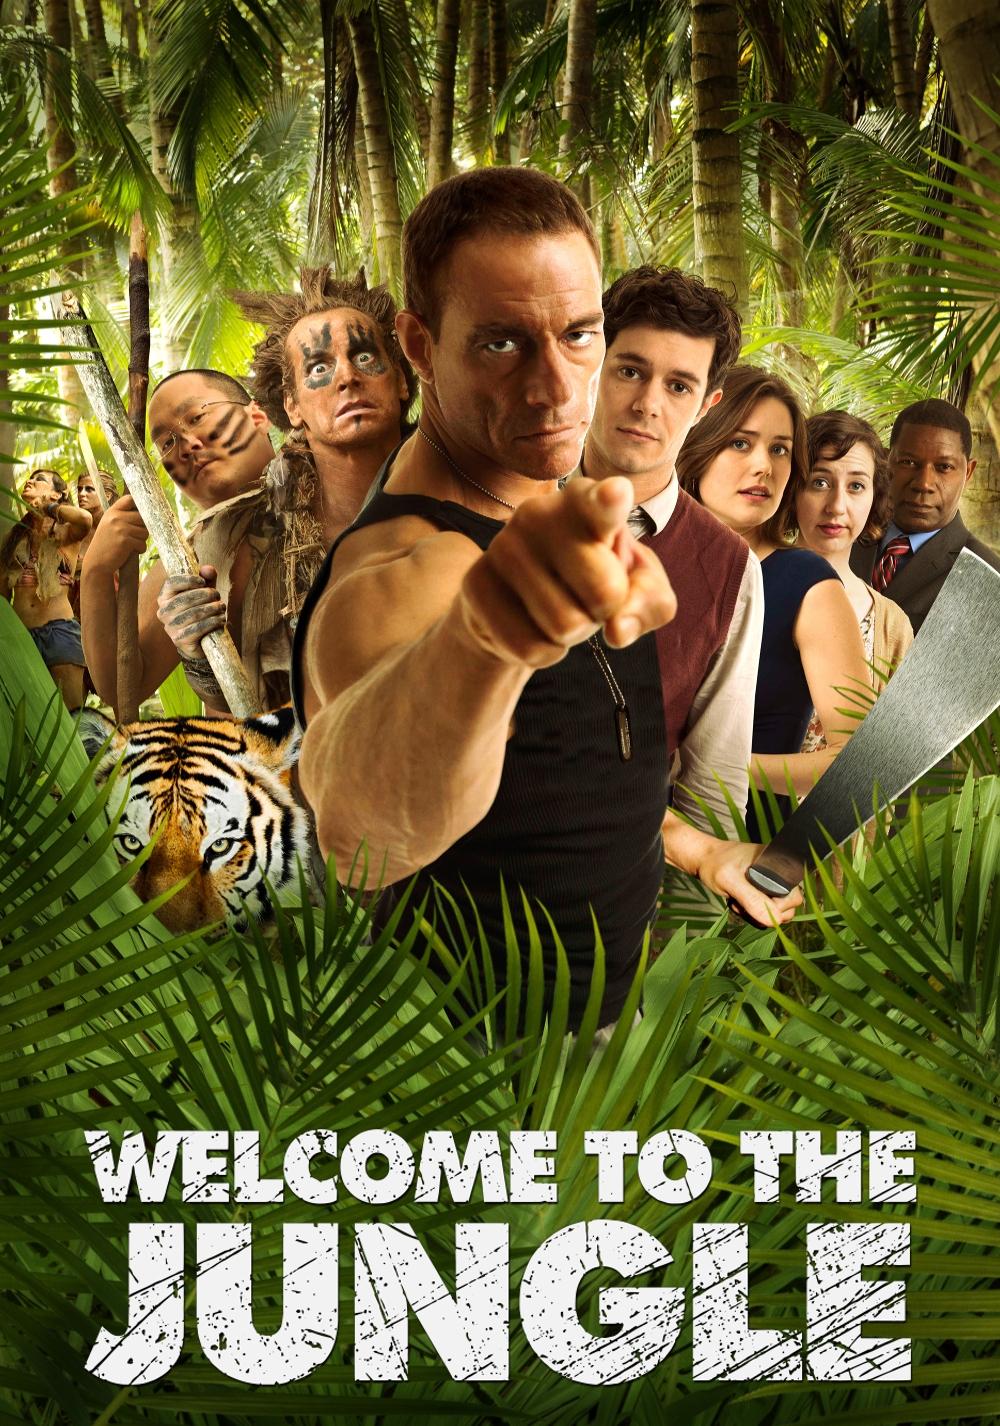 Welcom To The Jungle